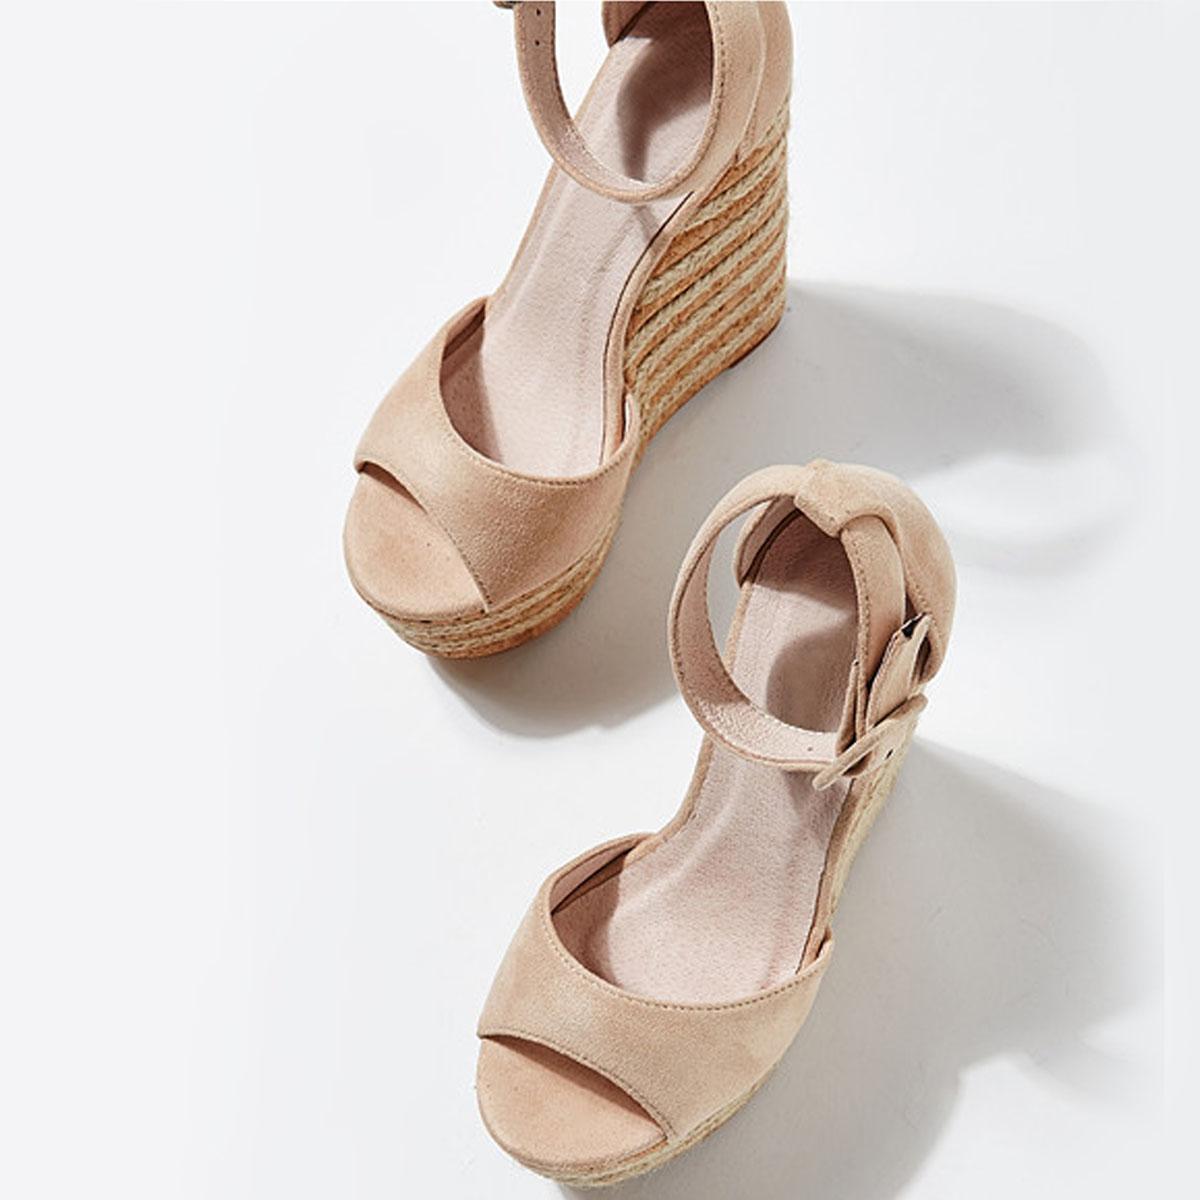 Womens Ladies High Heel Platform Wedge Summer Sandals Espadrilles Party Size UK